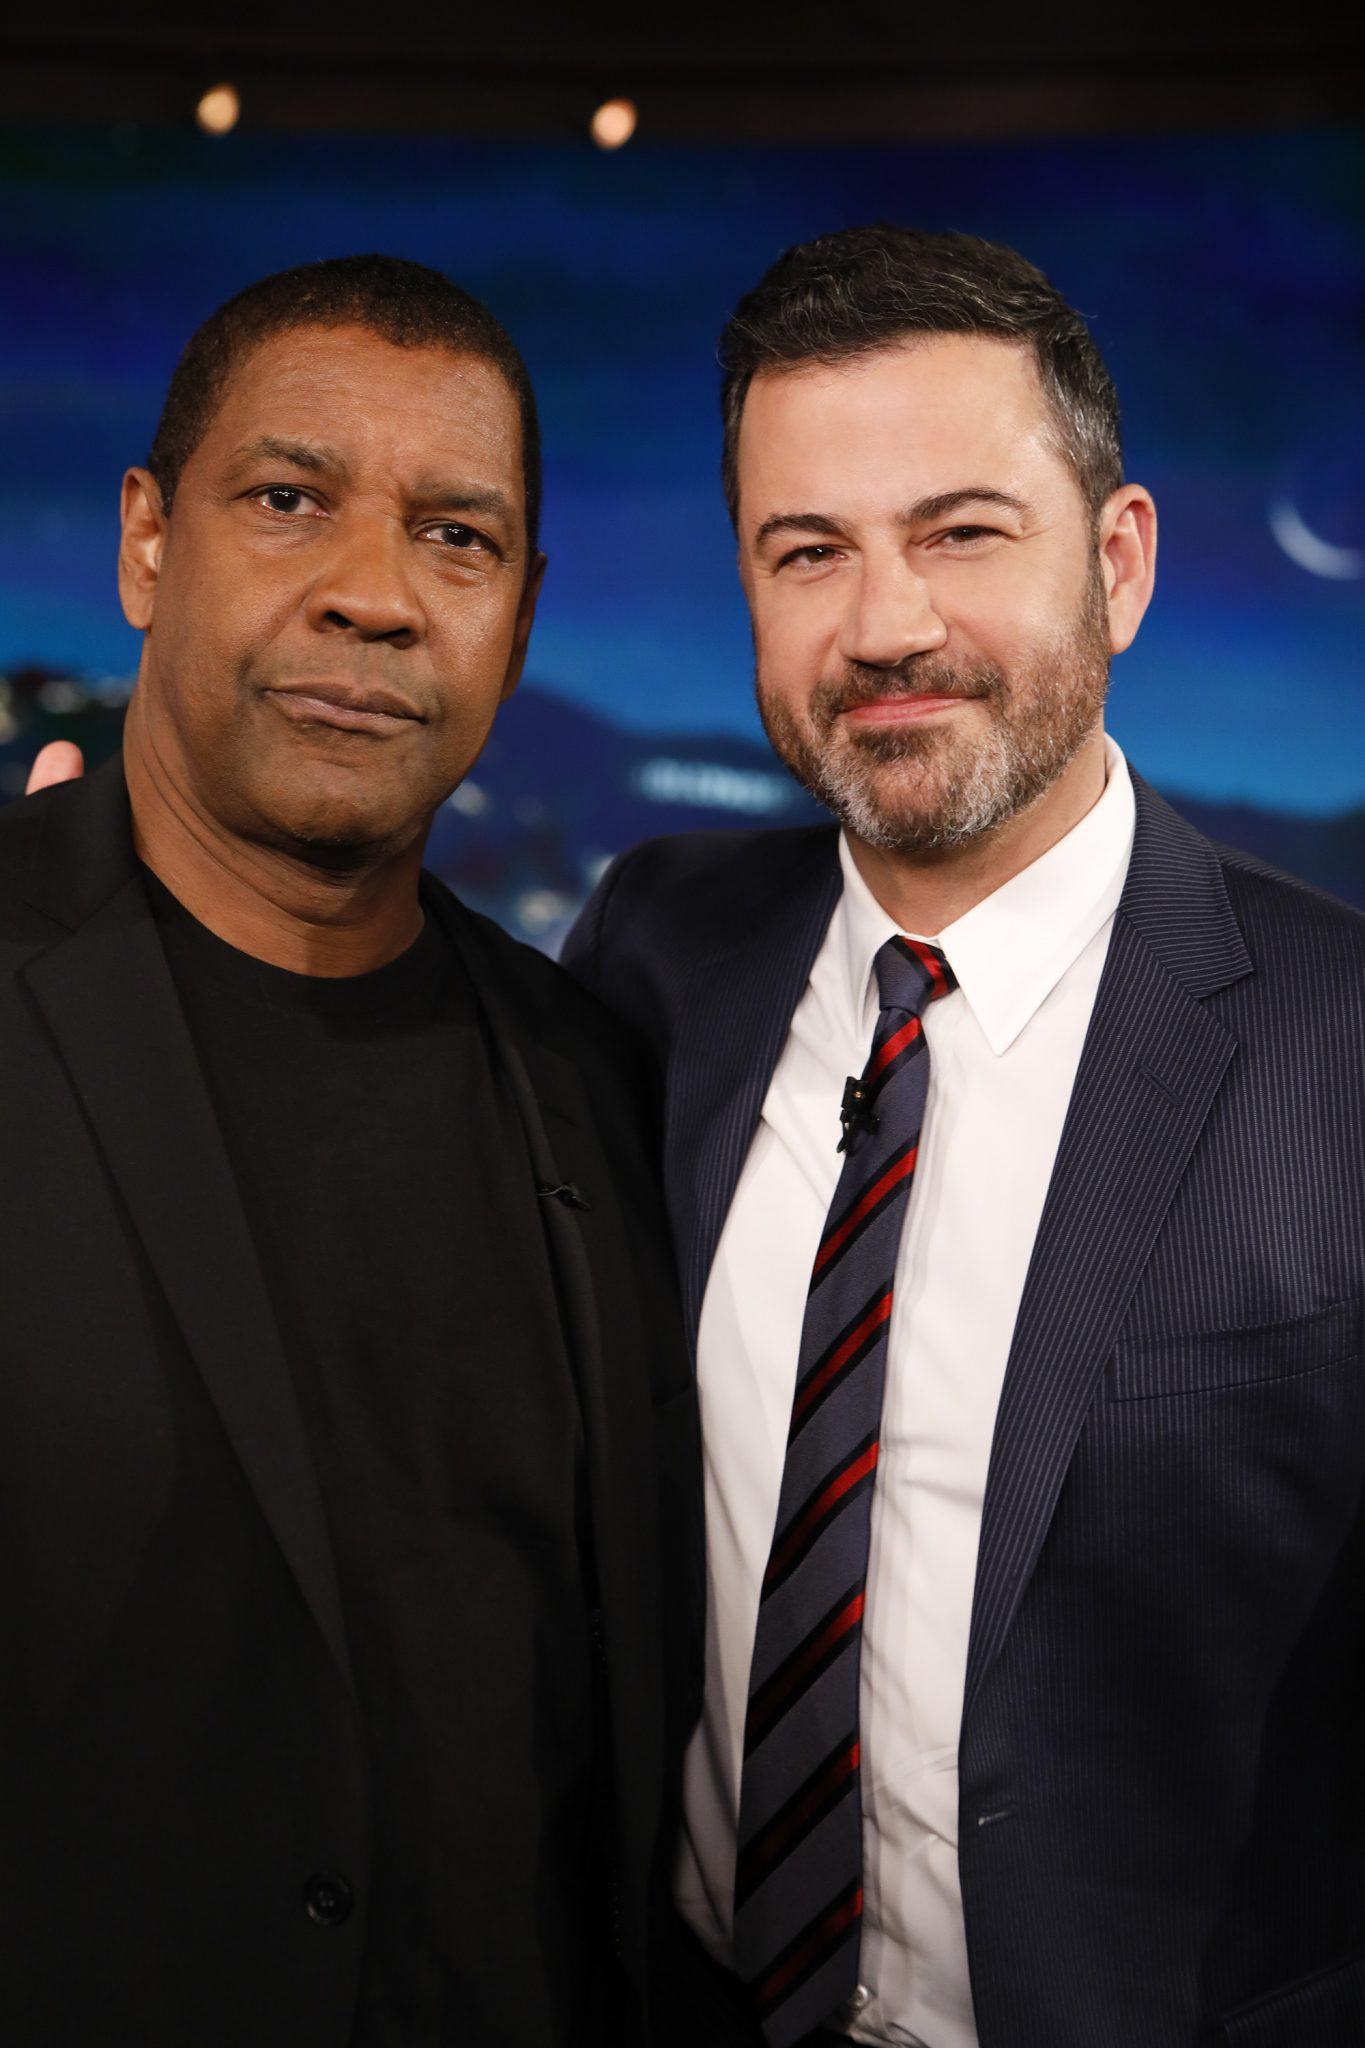 In Case You Missed It: Denzel Washington On Jimmy Kimmel Live